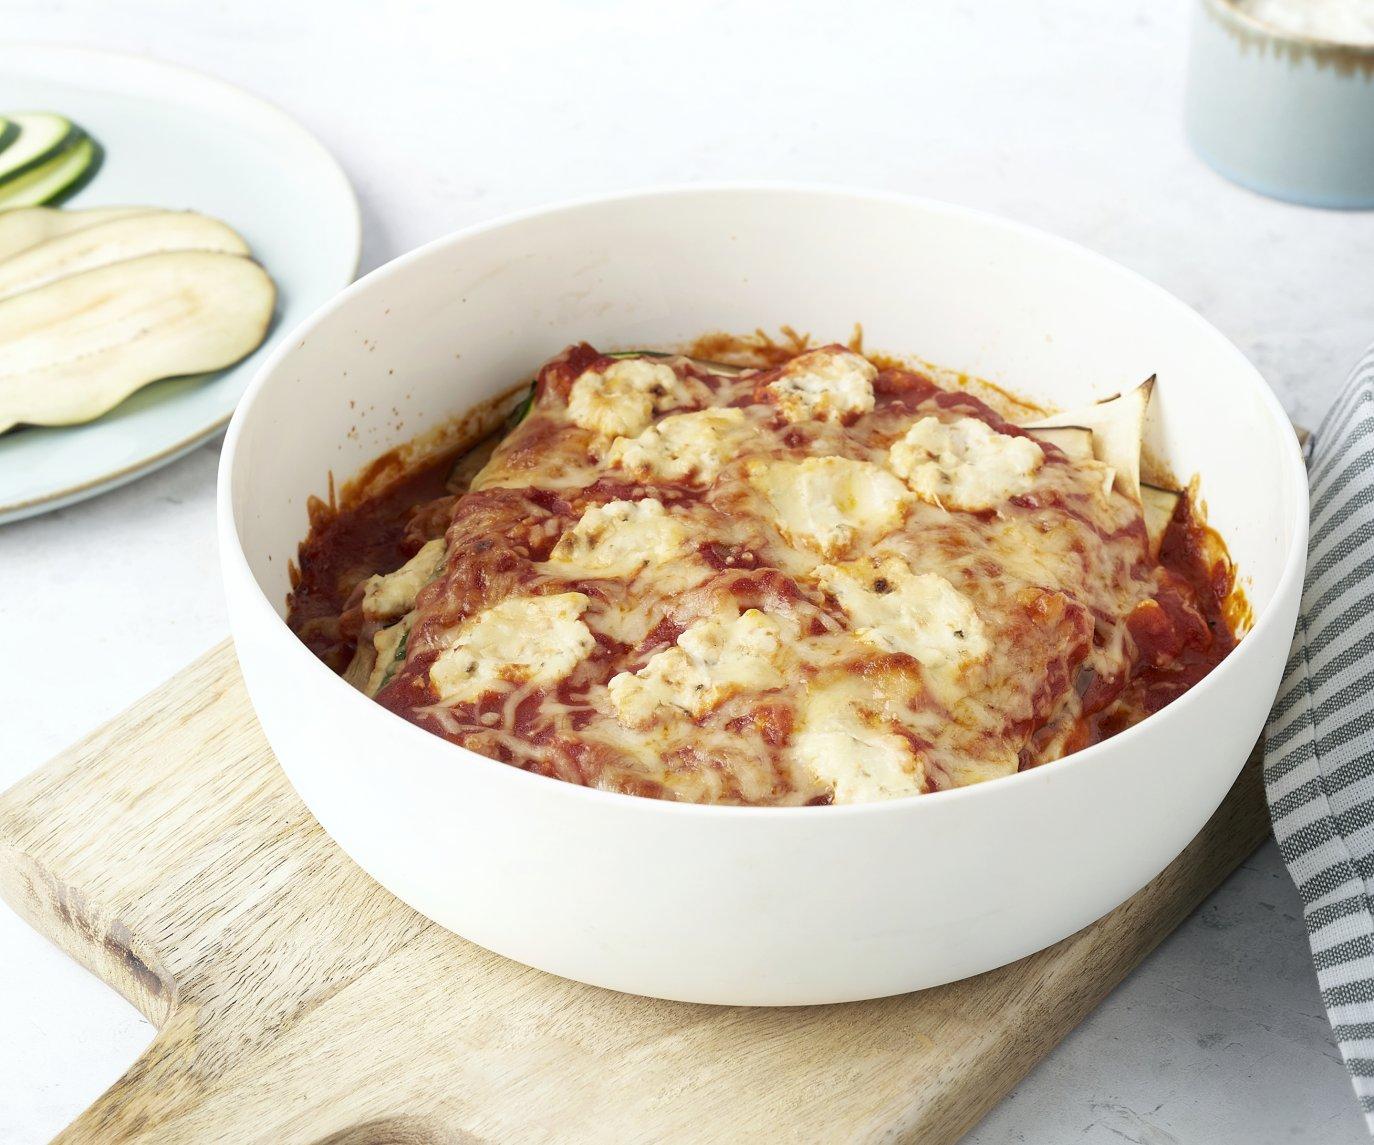 Lichte lasagne van courgette en aubergine